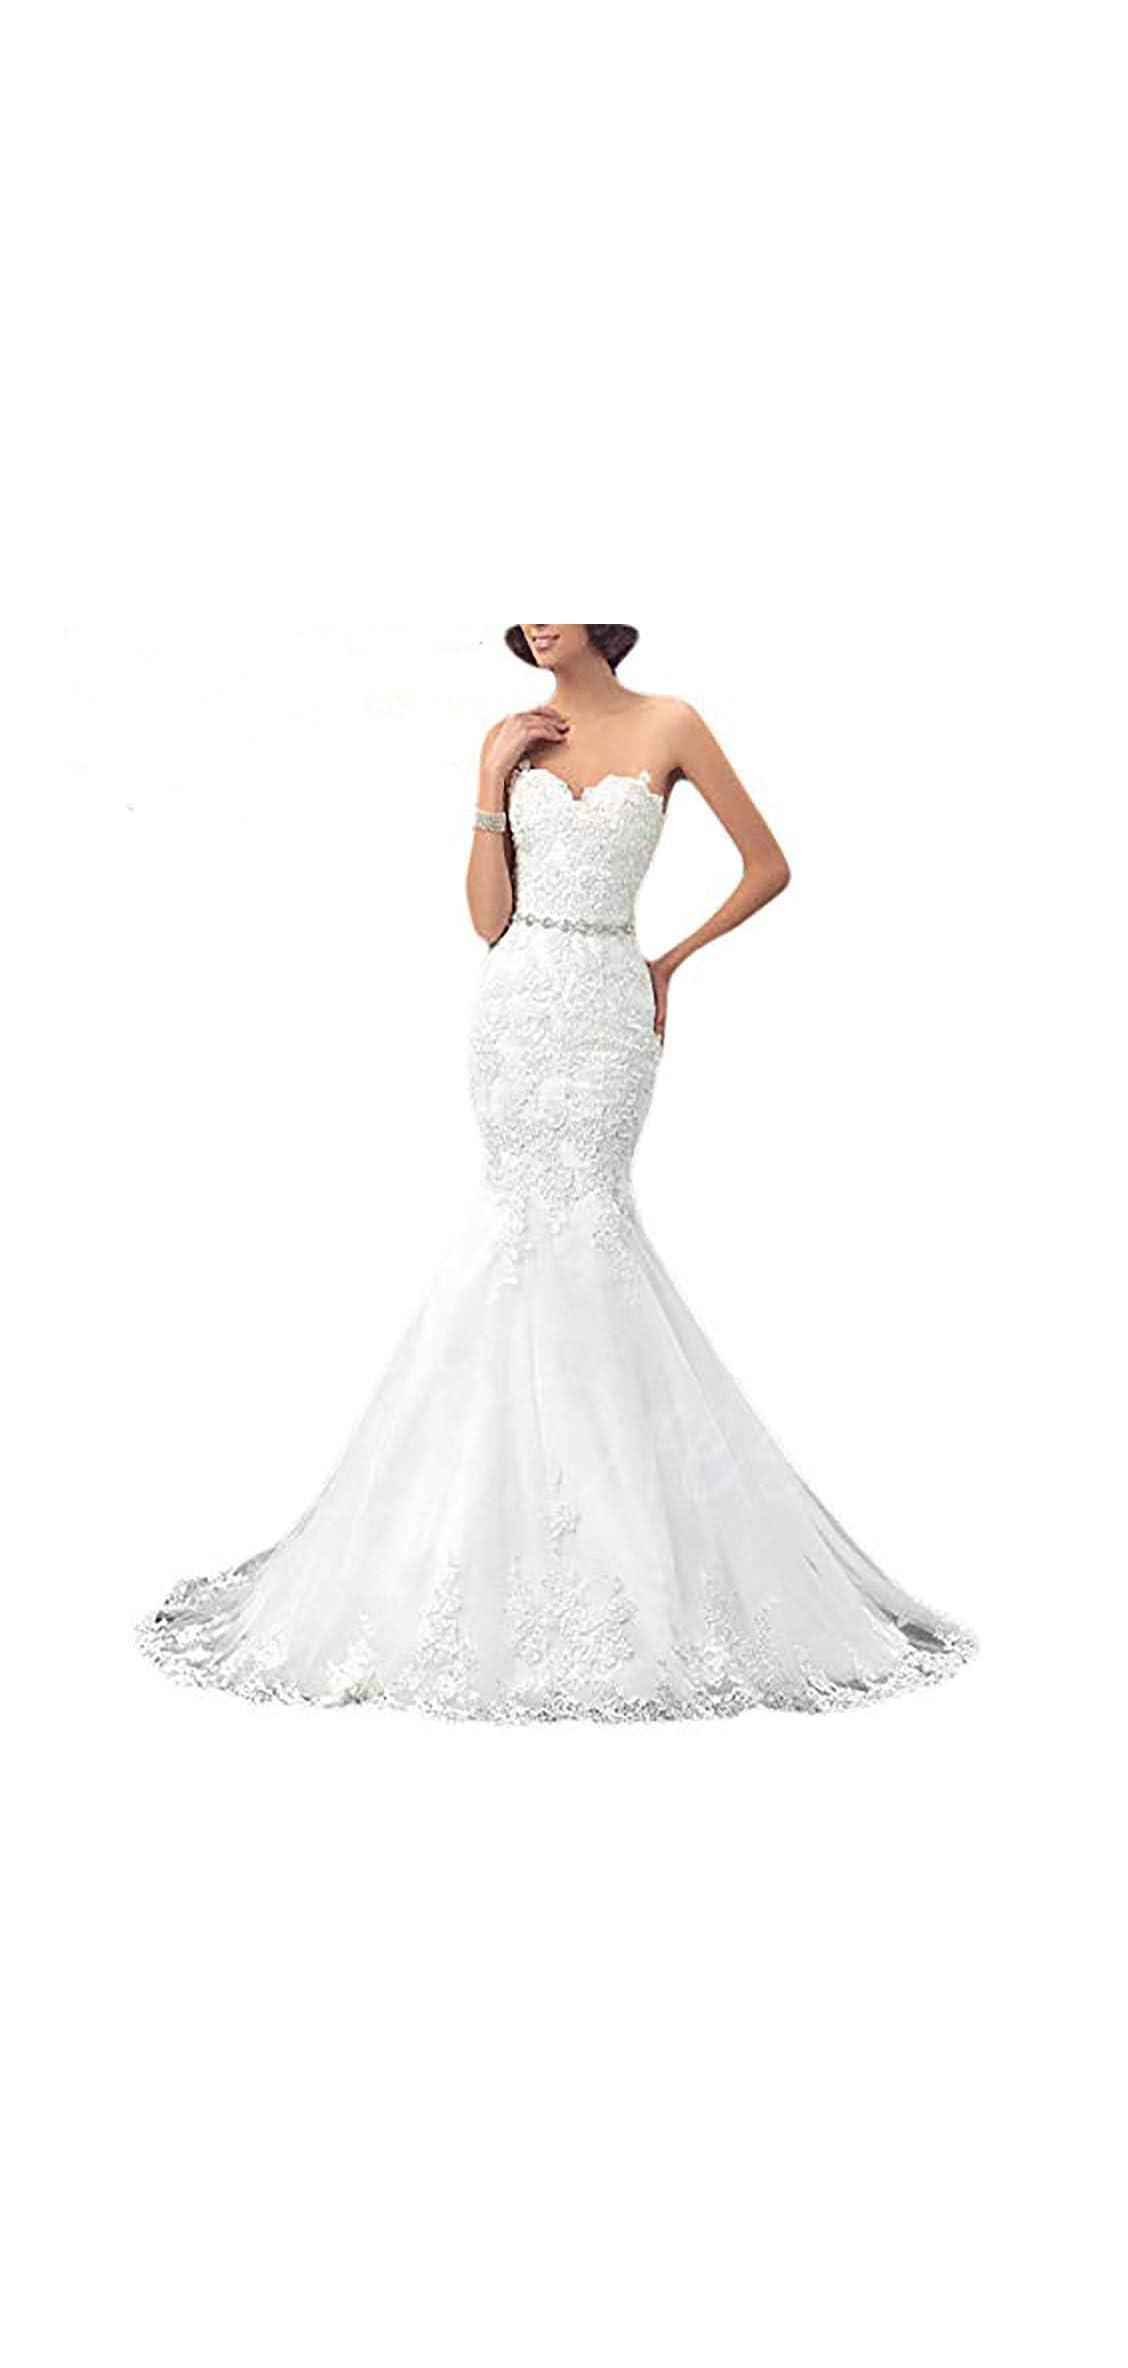 Womens Formal Strapless Sweetheart Mermaid Wedding Dress